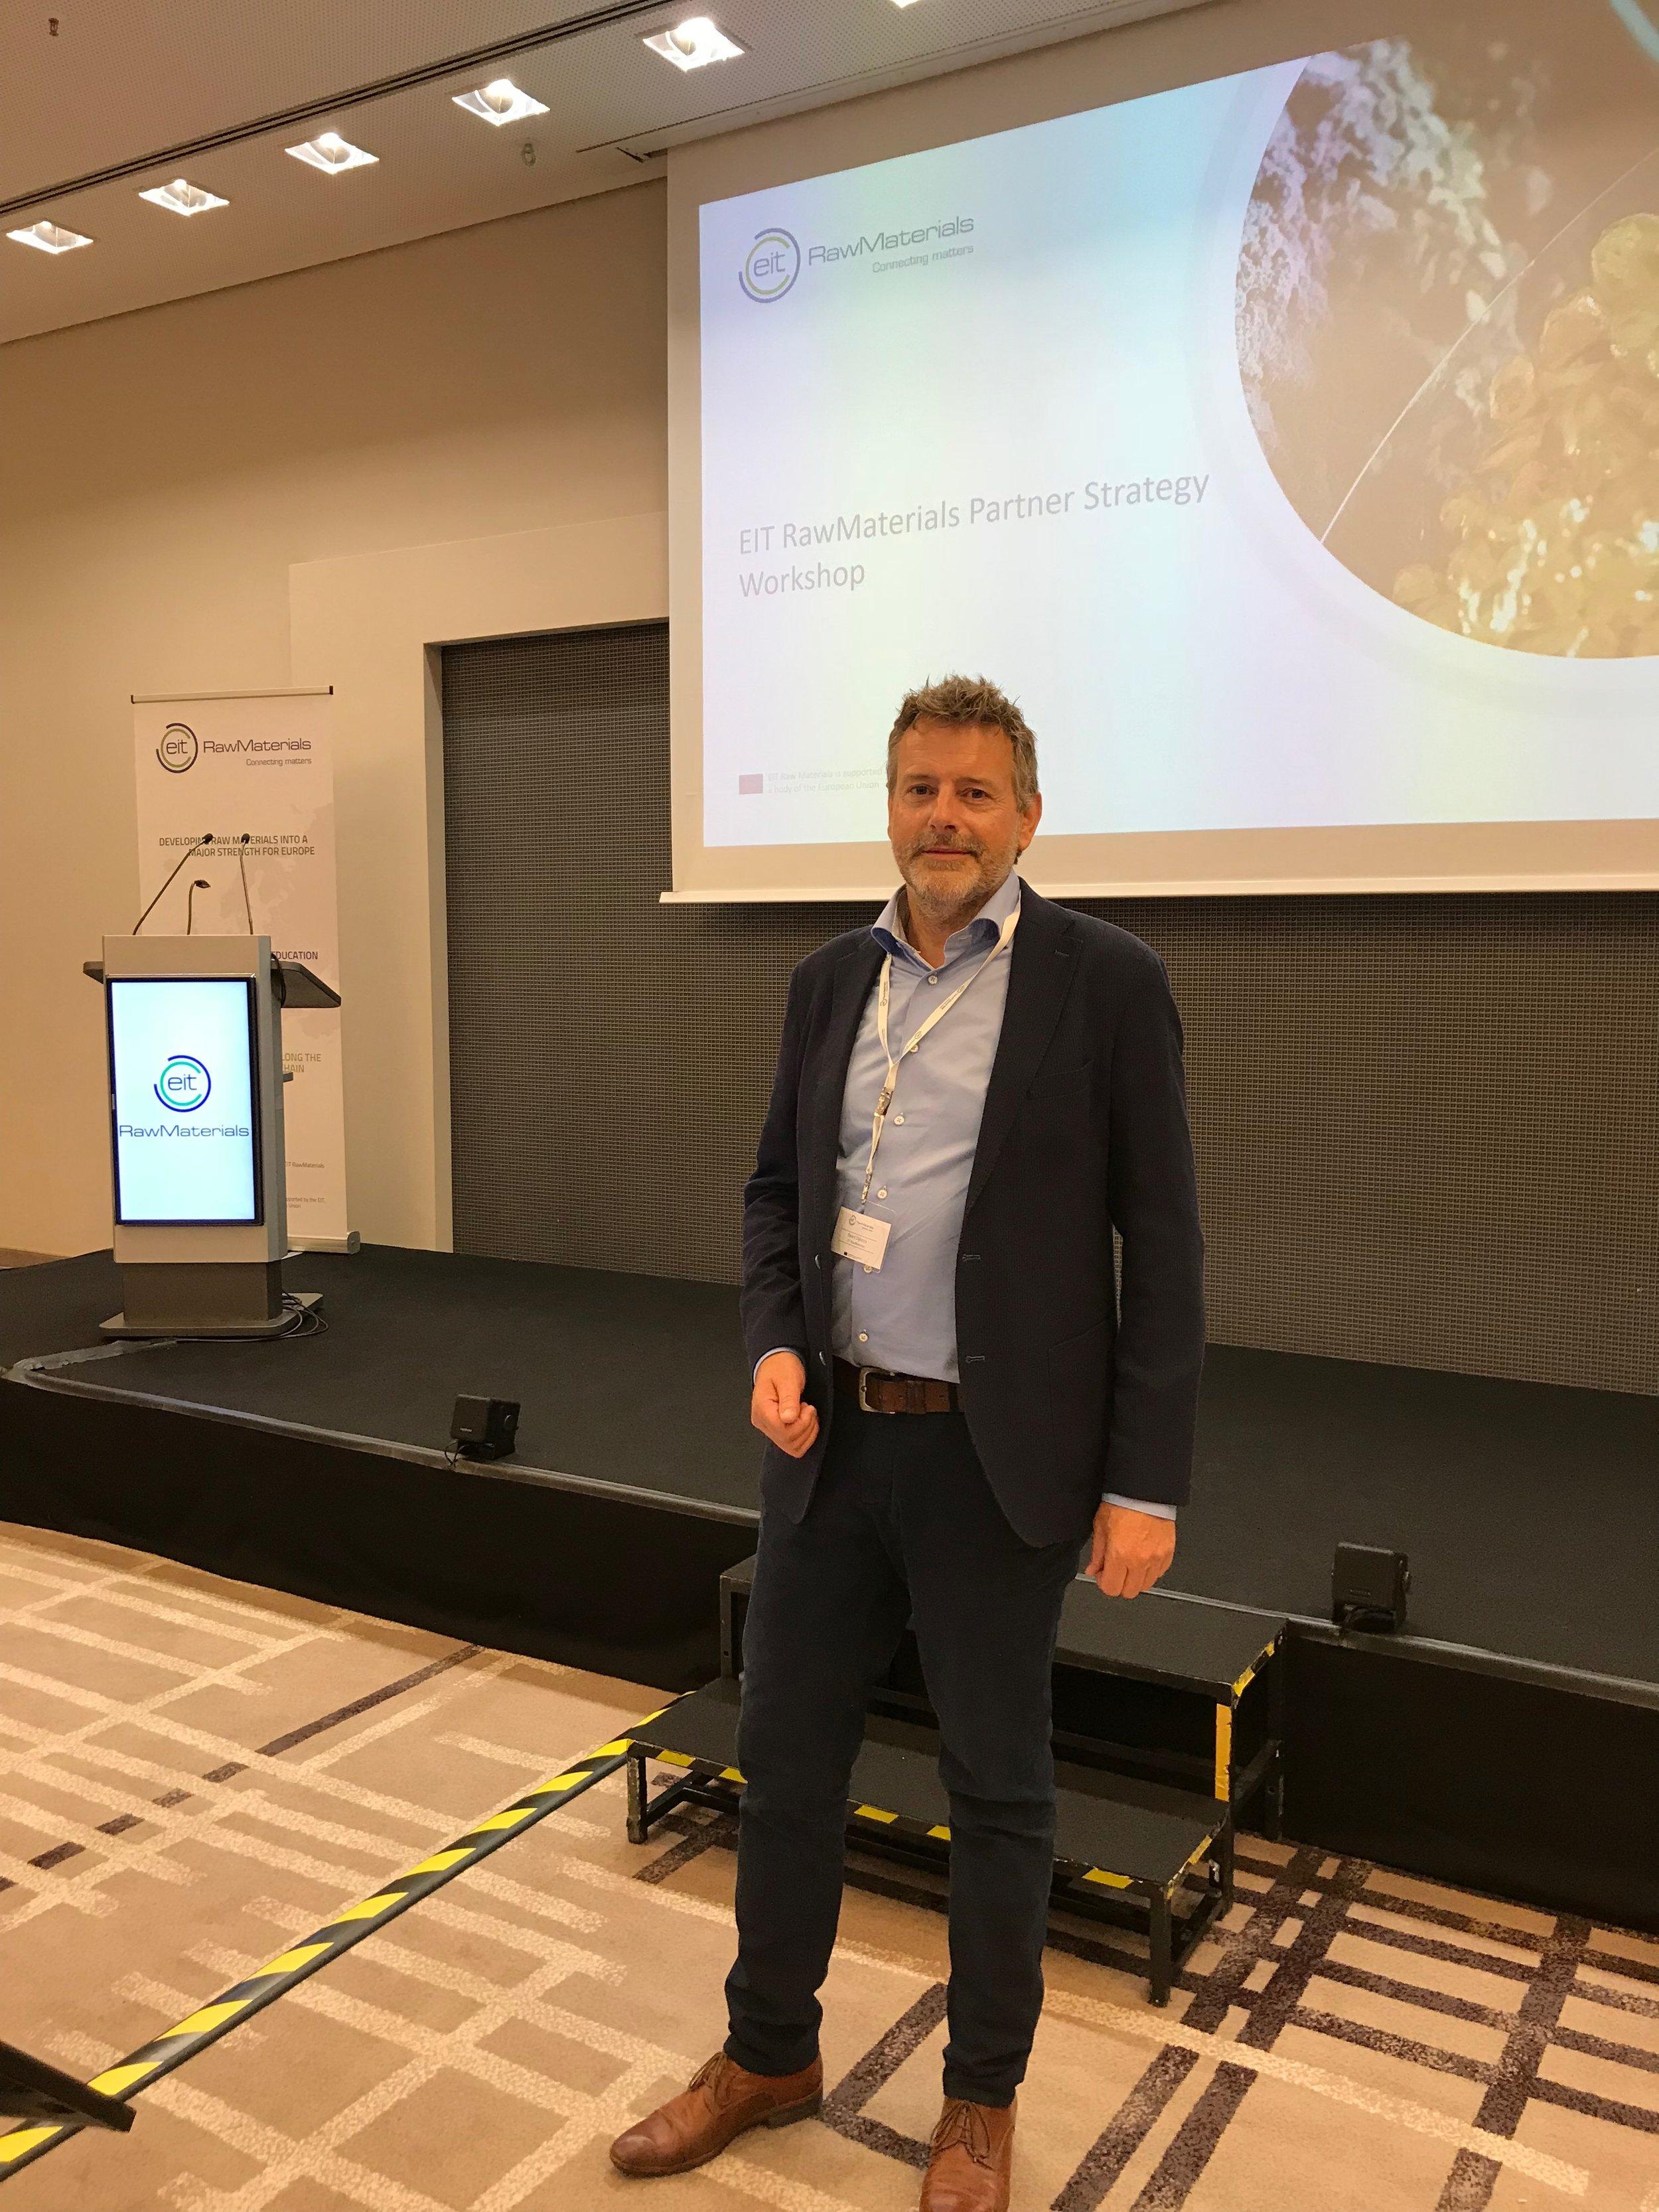 Beant Dijkstra, Business Developer at EIT RawMaterials